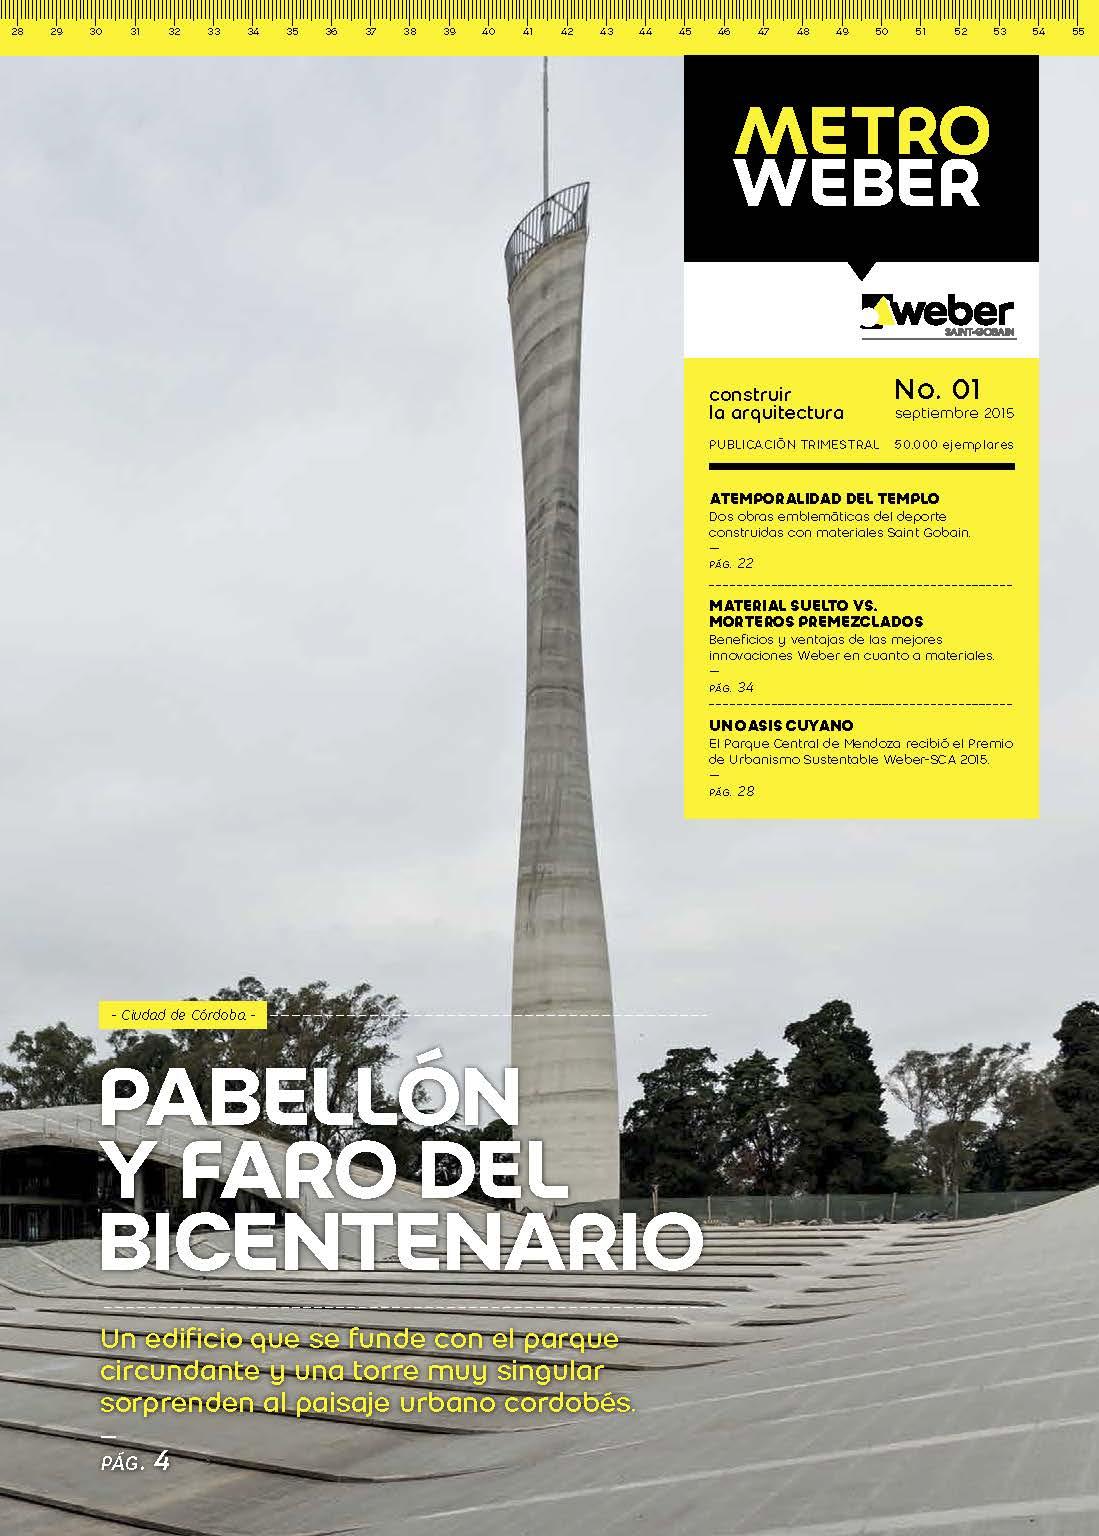 MetroWeber-01 21-08-15_Página_01